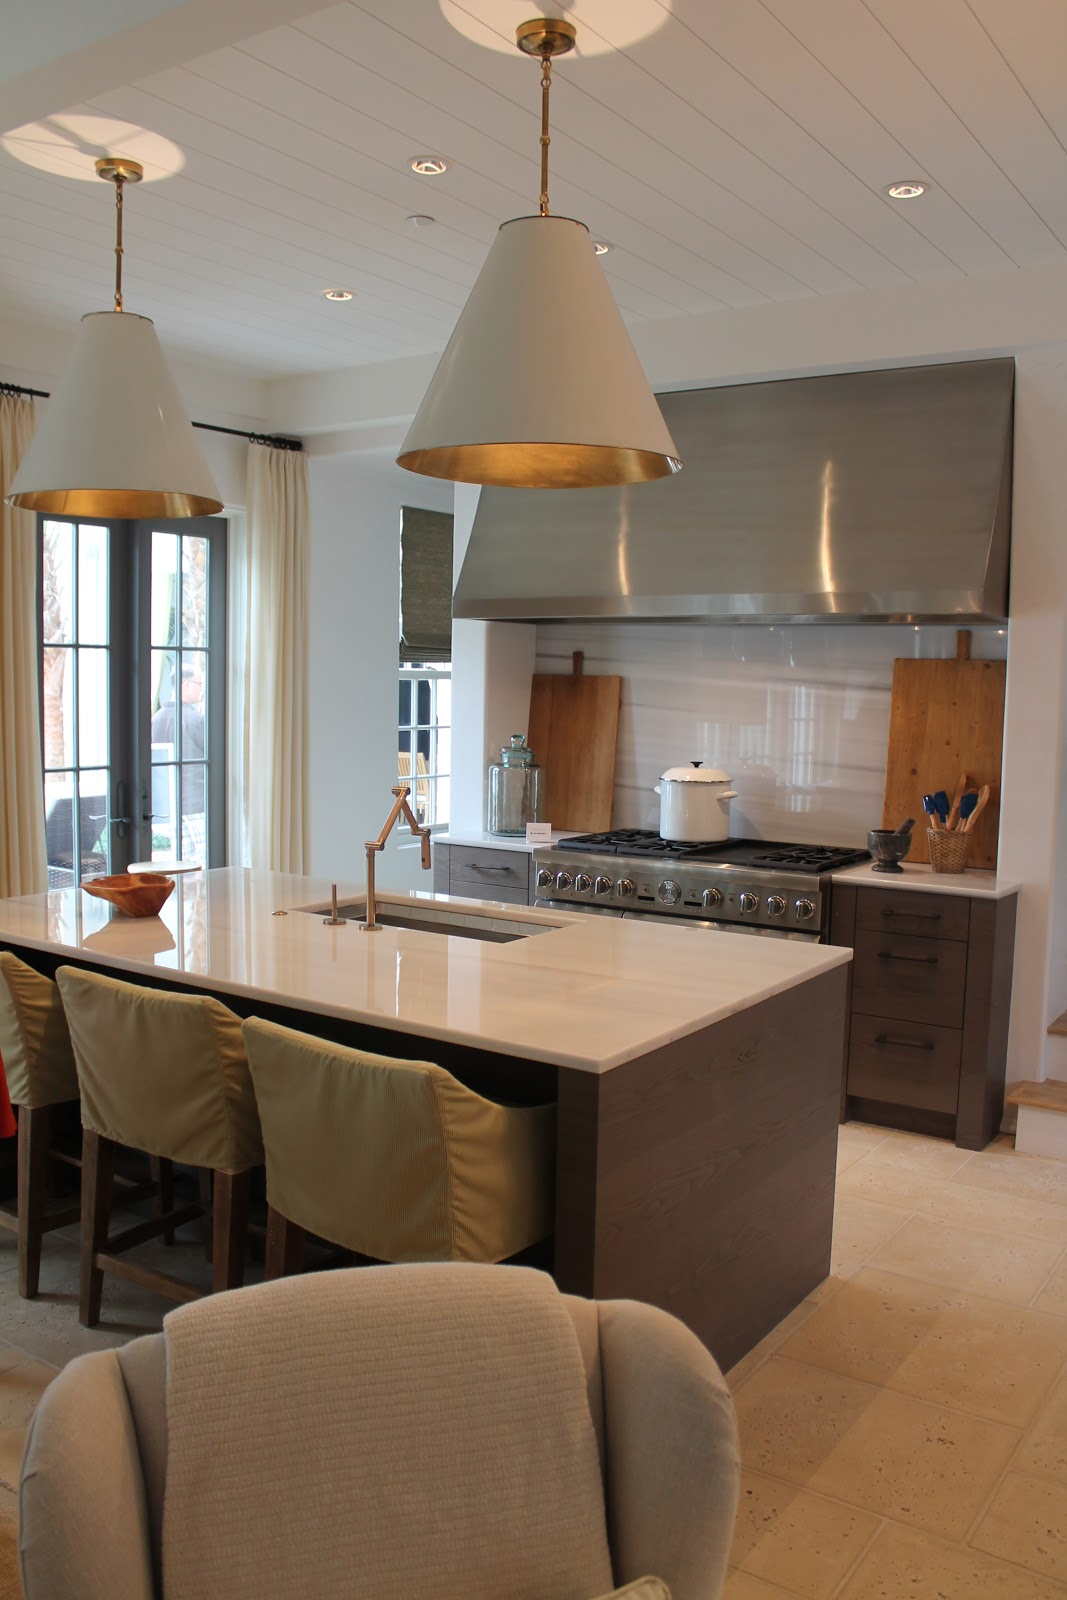 Kitchen chair slipcovers Photo - 5